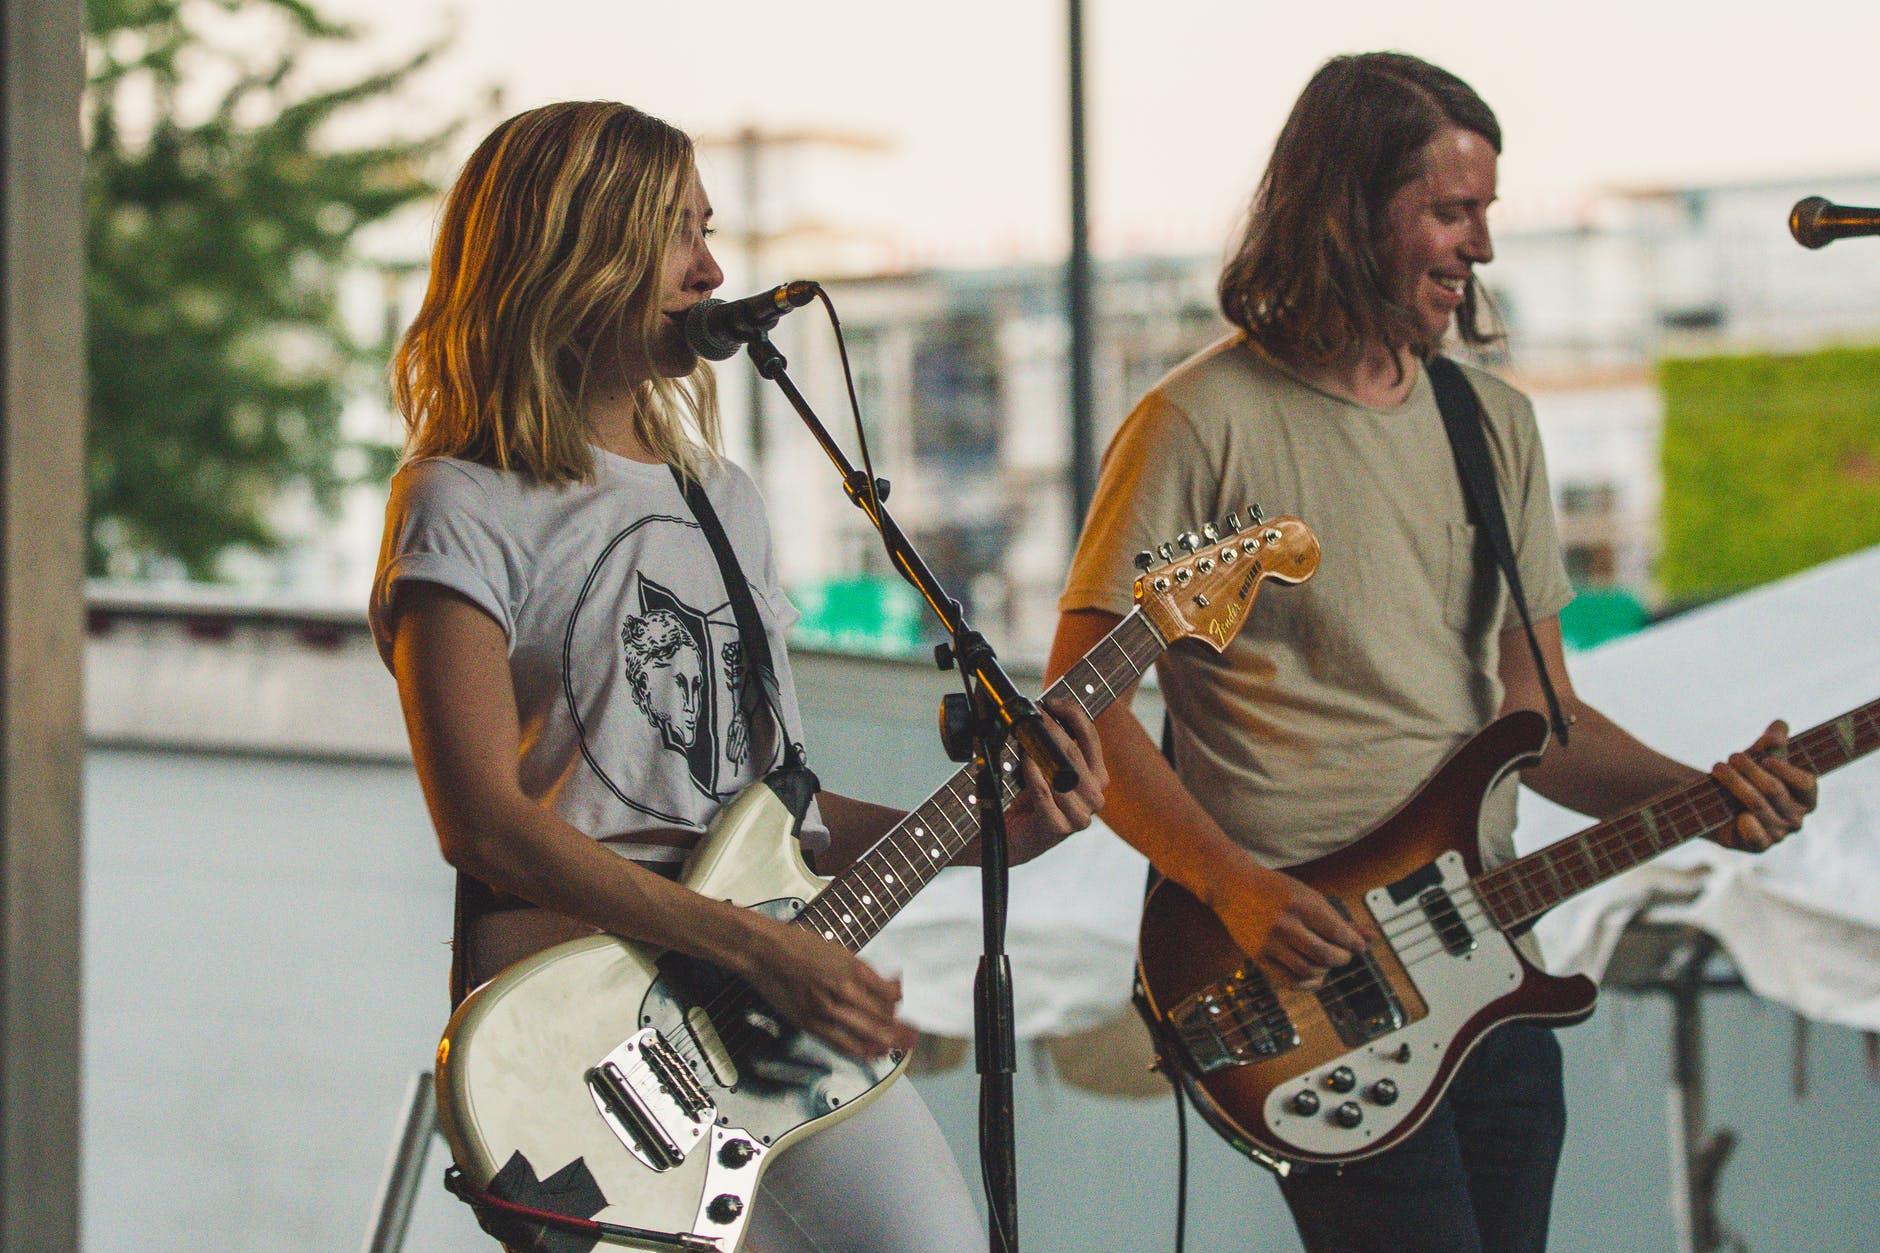 woman playing guitar while singing beside man playing bass guitar near microphone